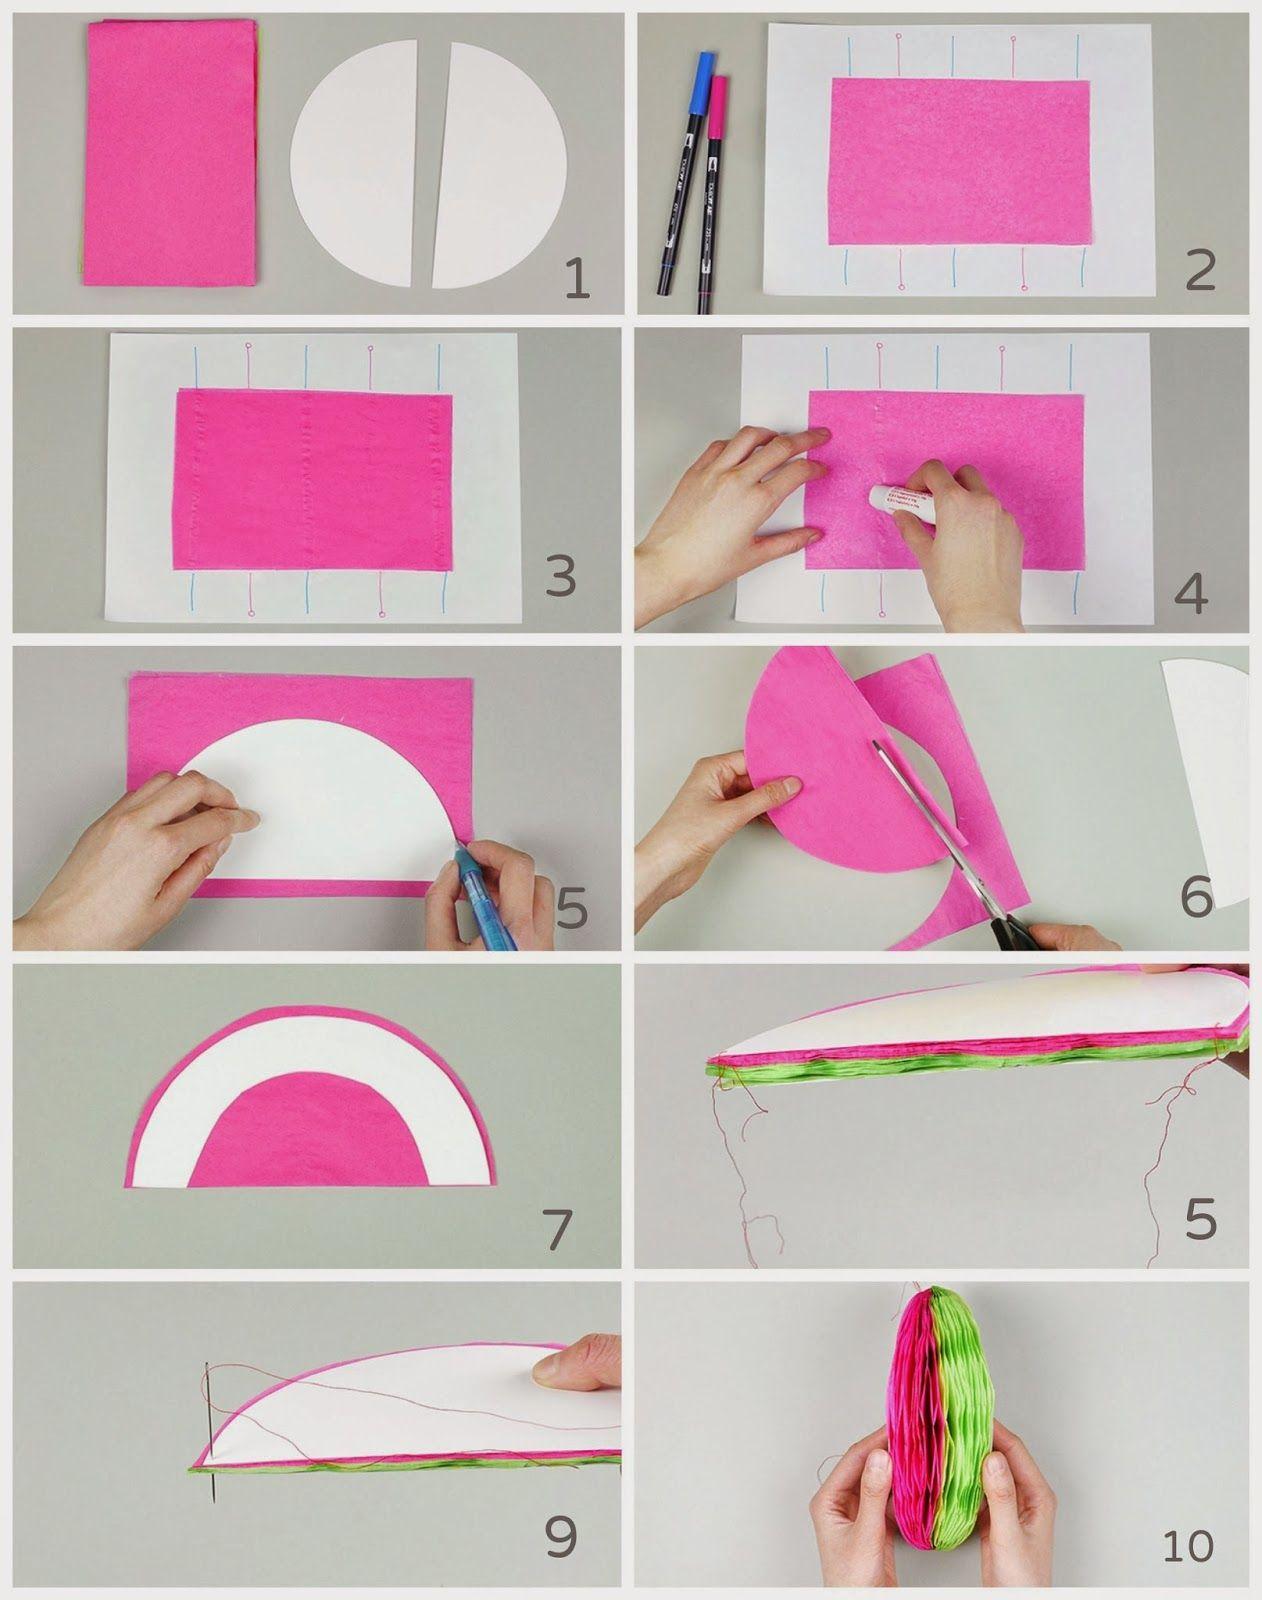 Facilisimo manualidades de papel bolas de nido de abeja - Como hacer cadenetas de papel para fiestas ...